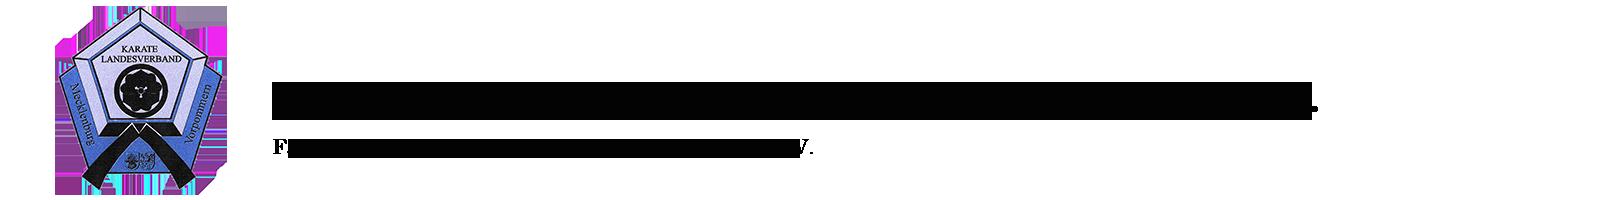 Karatelandesverband Mecklenburg-Vorpommern e.V. Logo